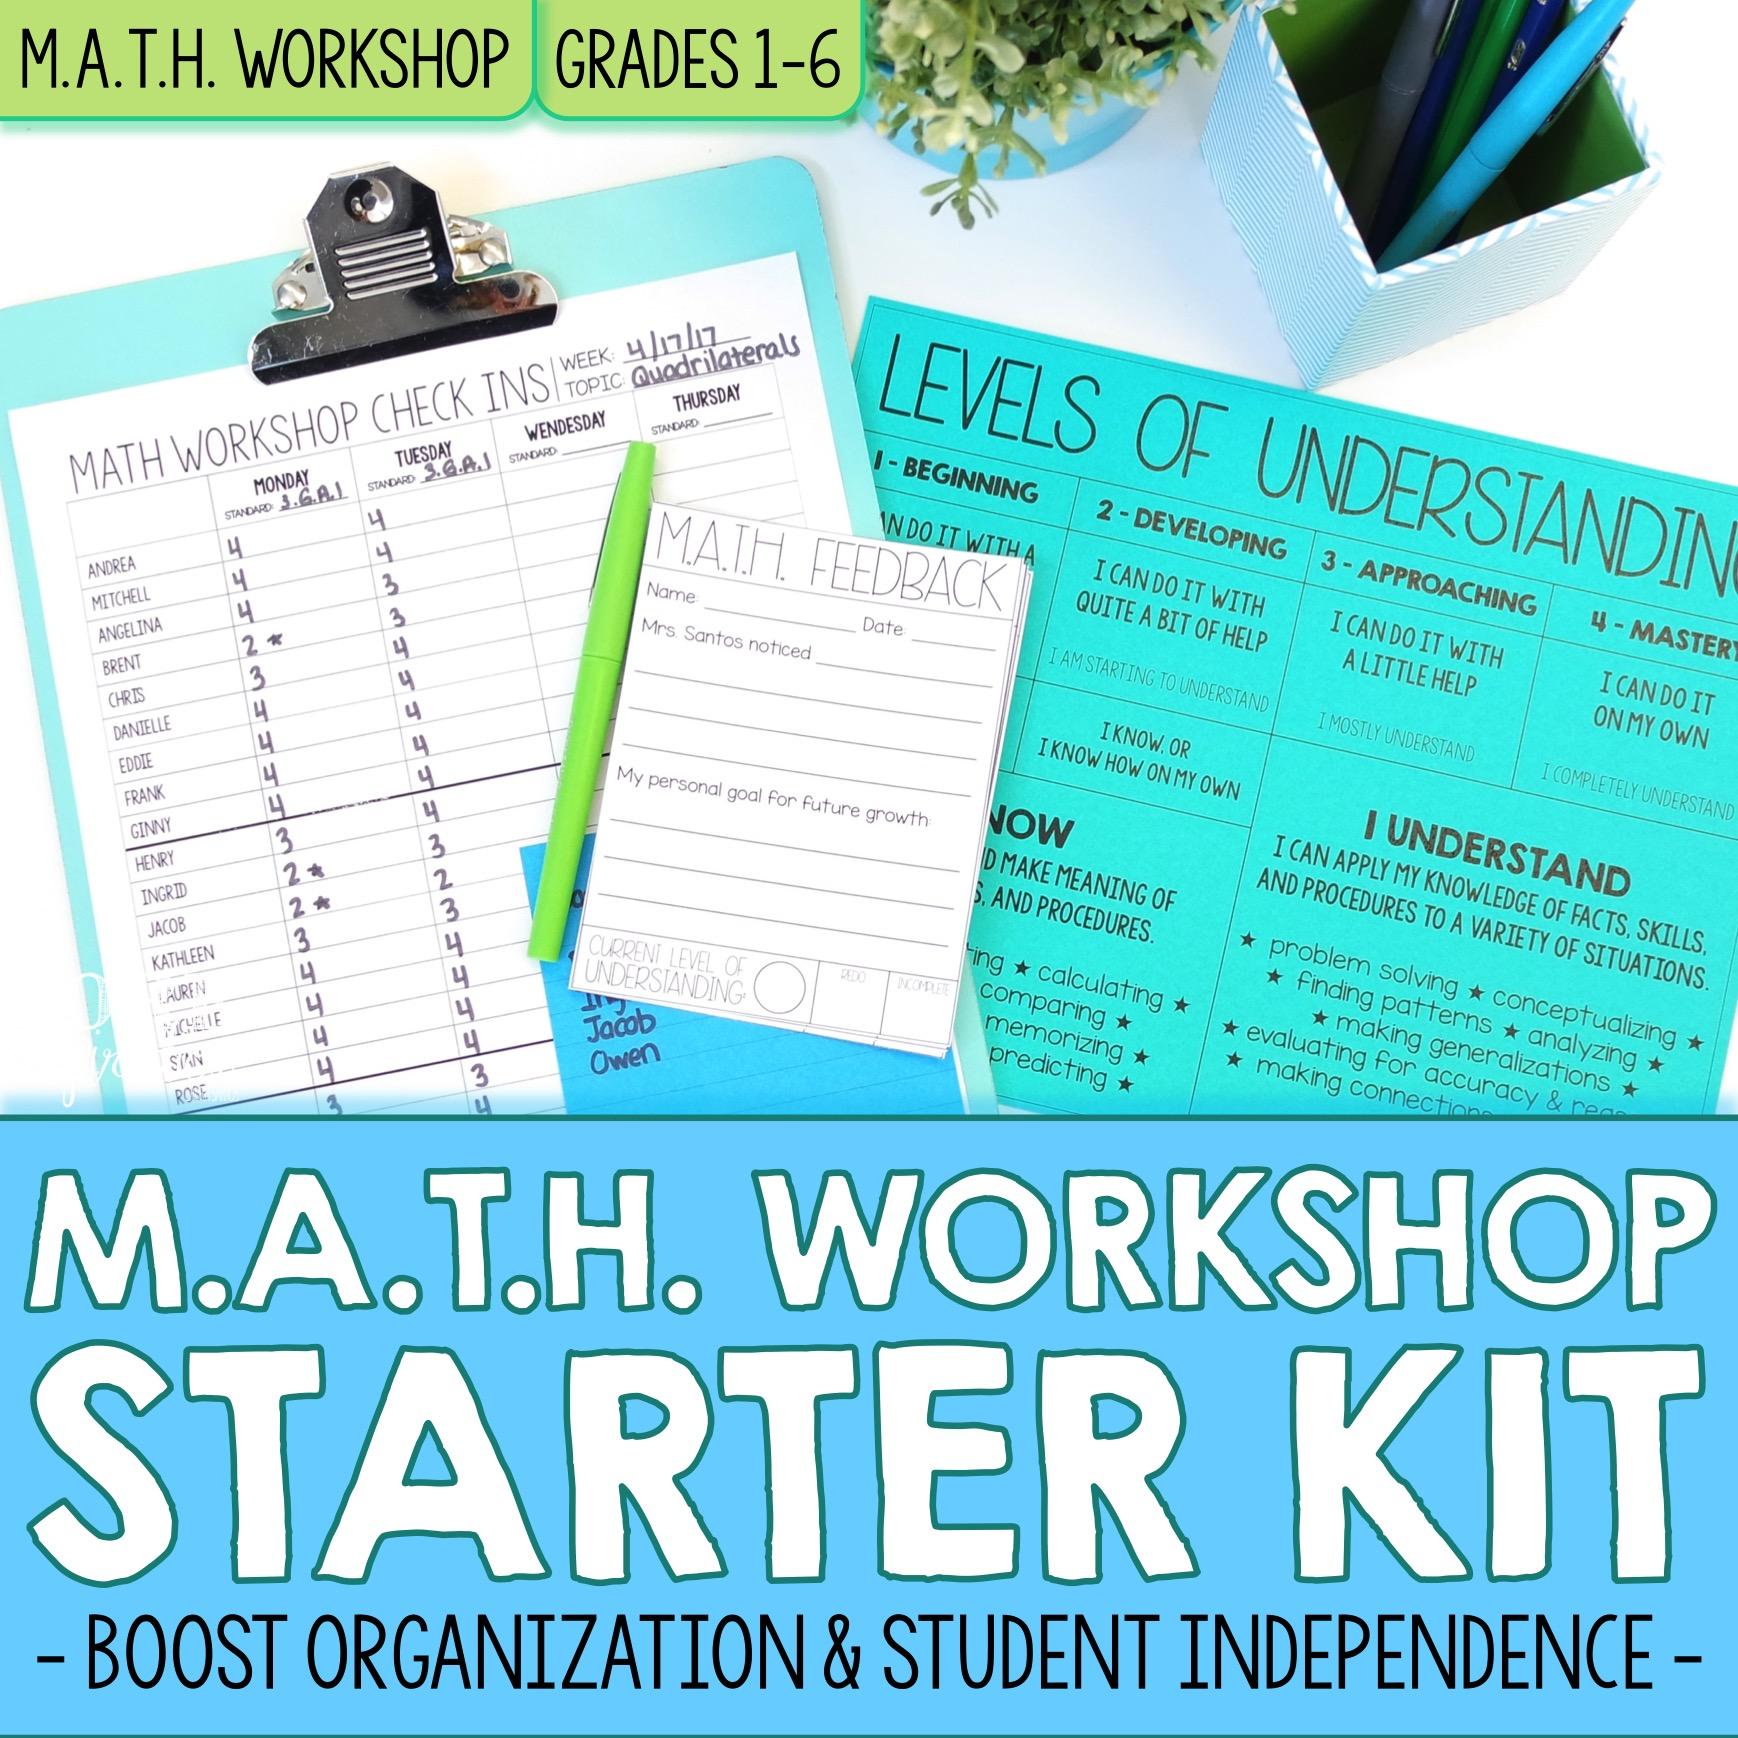 Math Workshop Starter Kit Cover